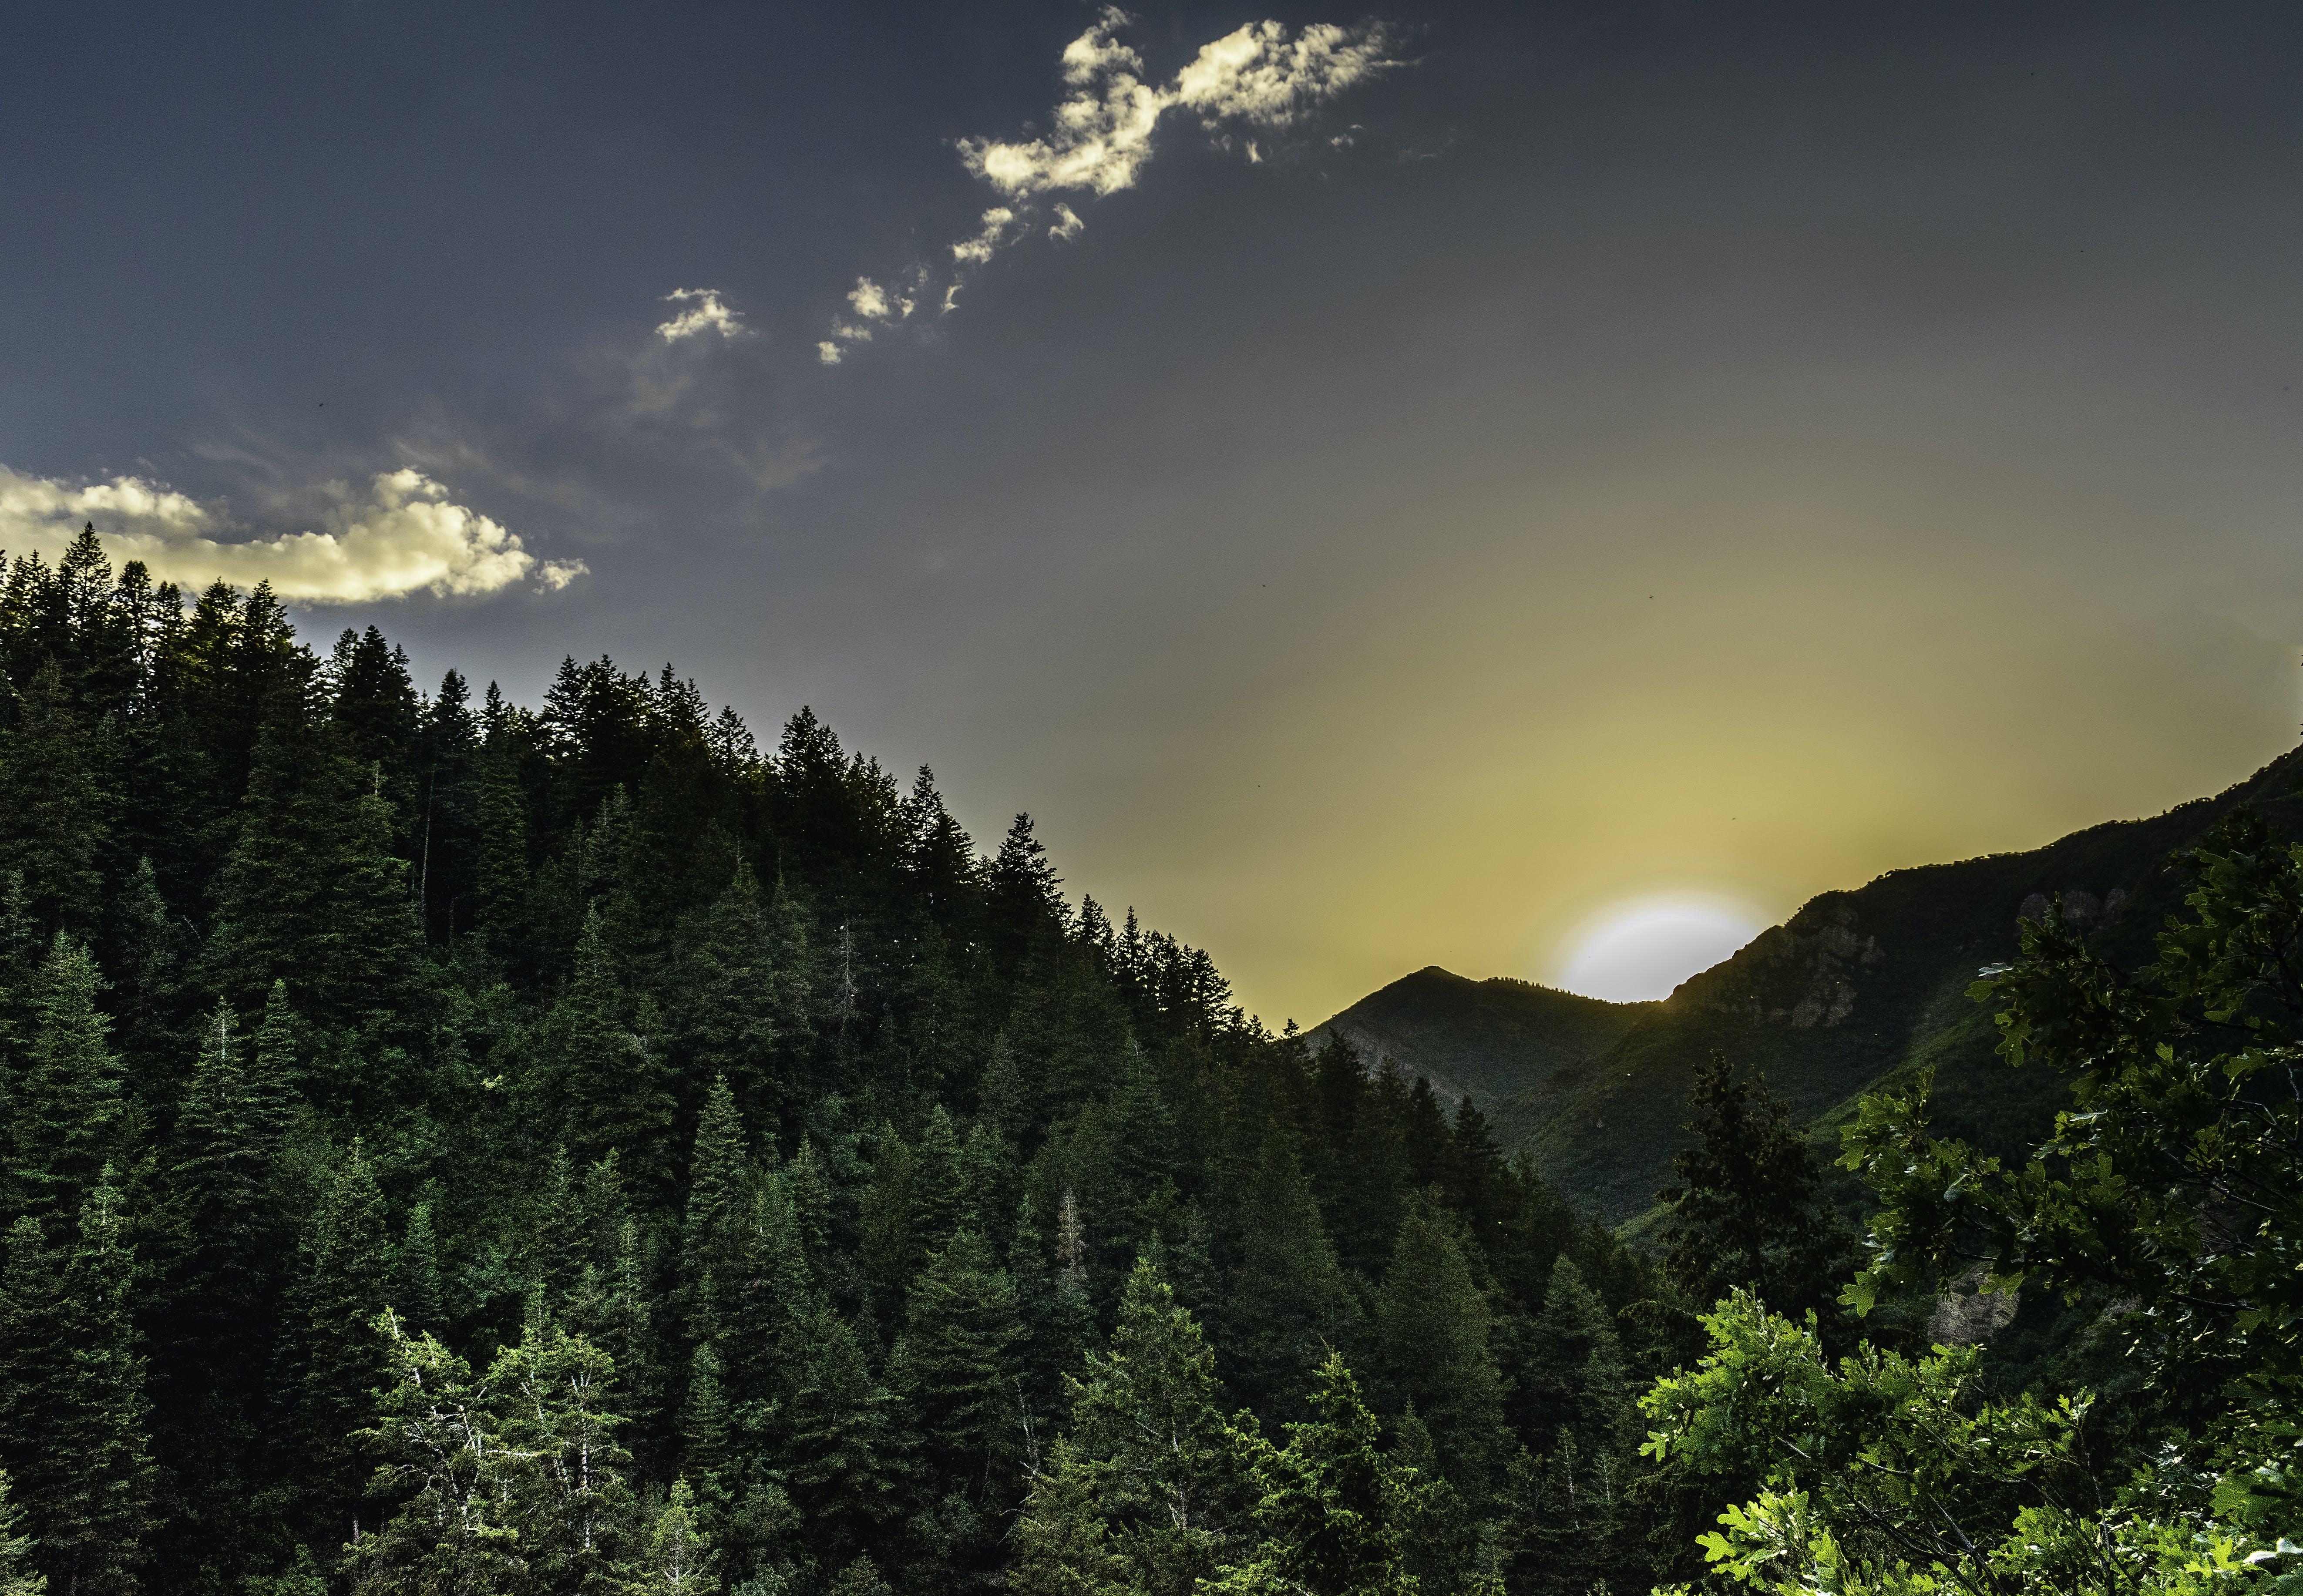 Kostnadsfri bild av berg, dagsljus, dimma, gryning